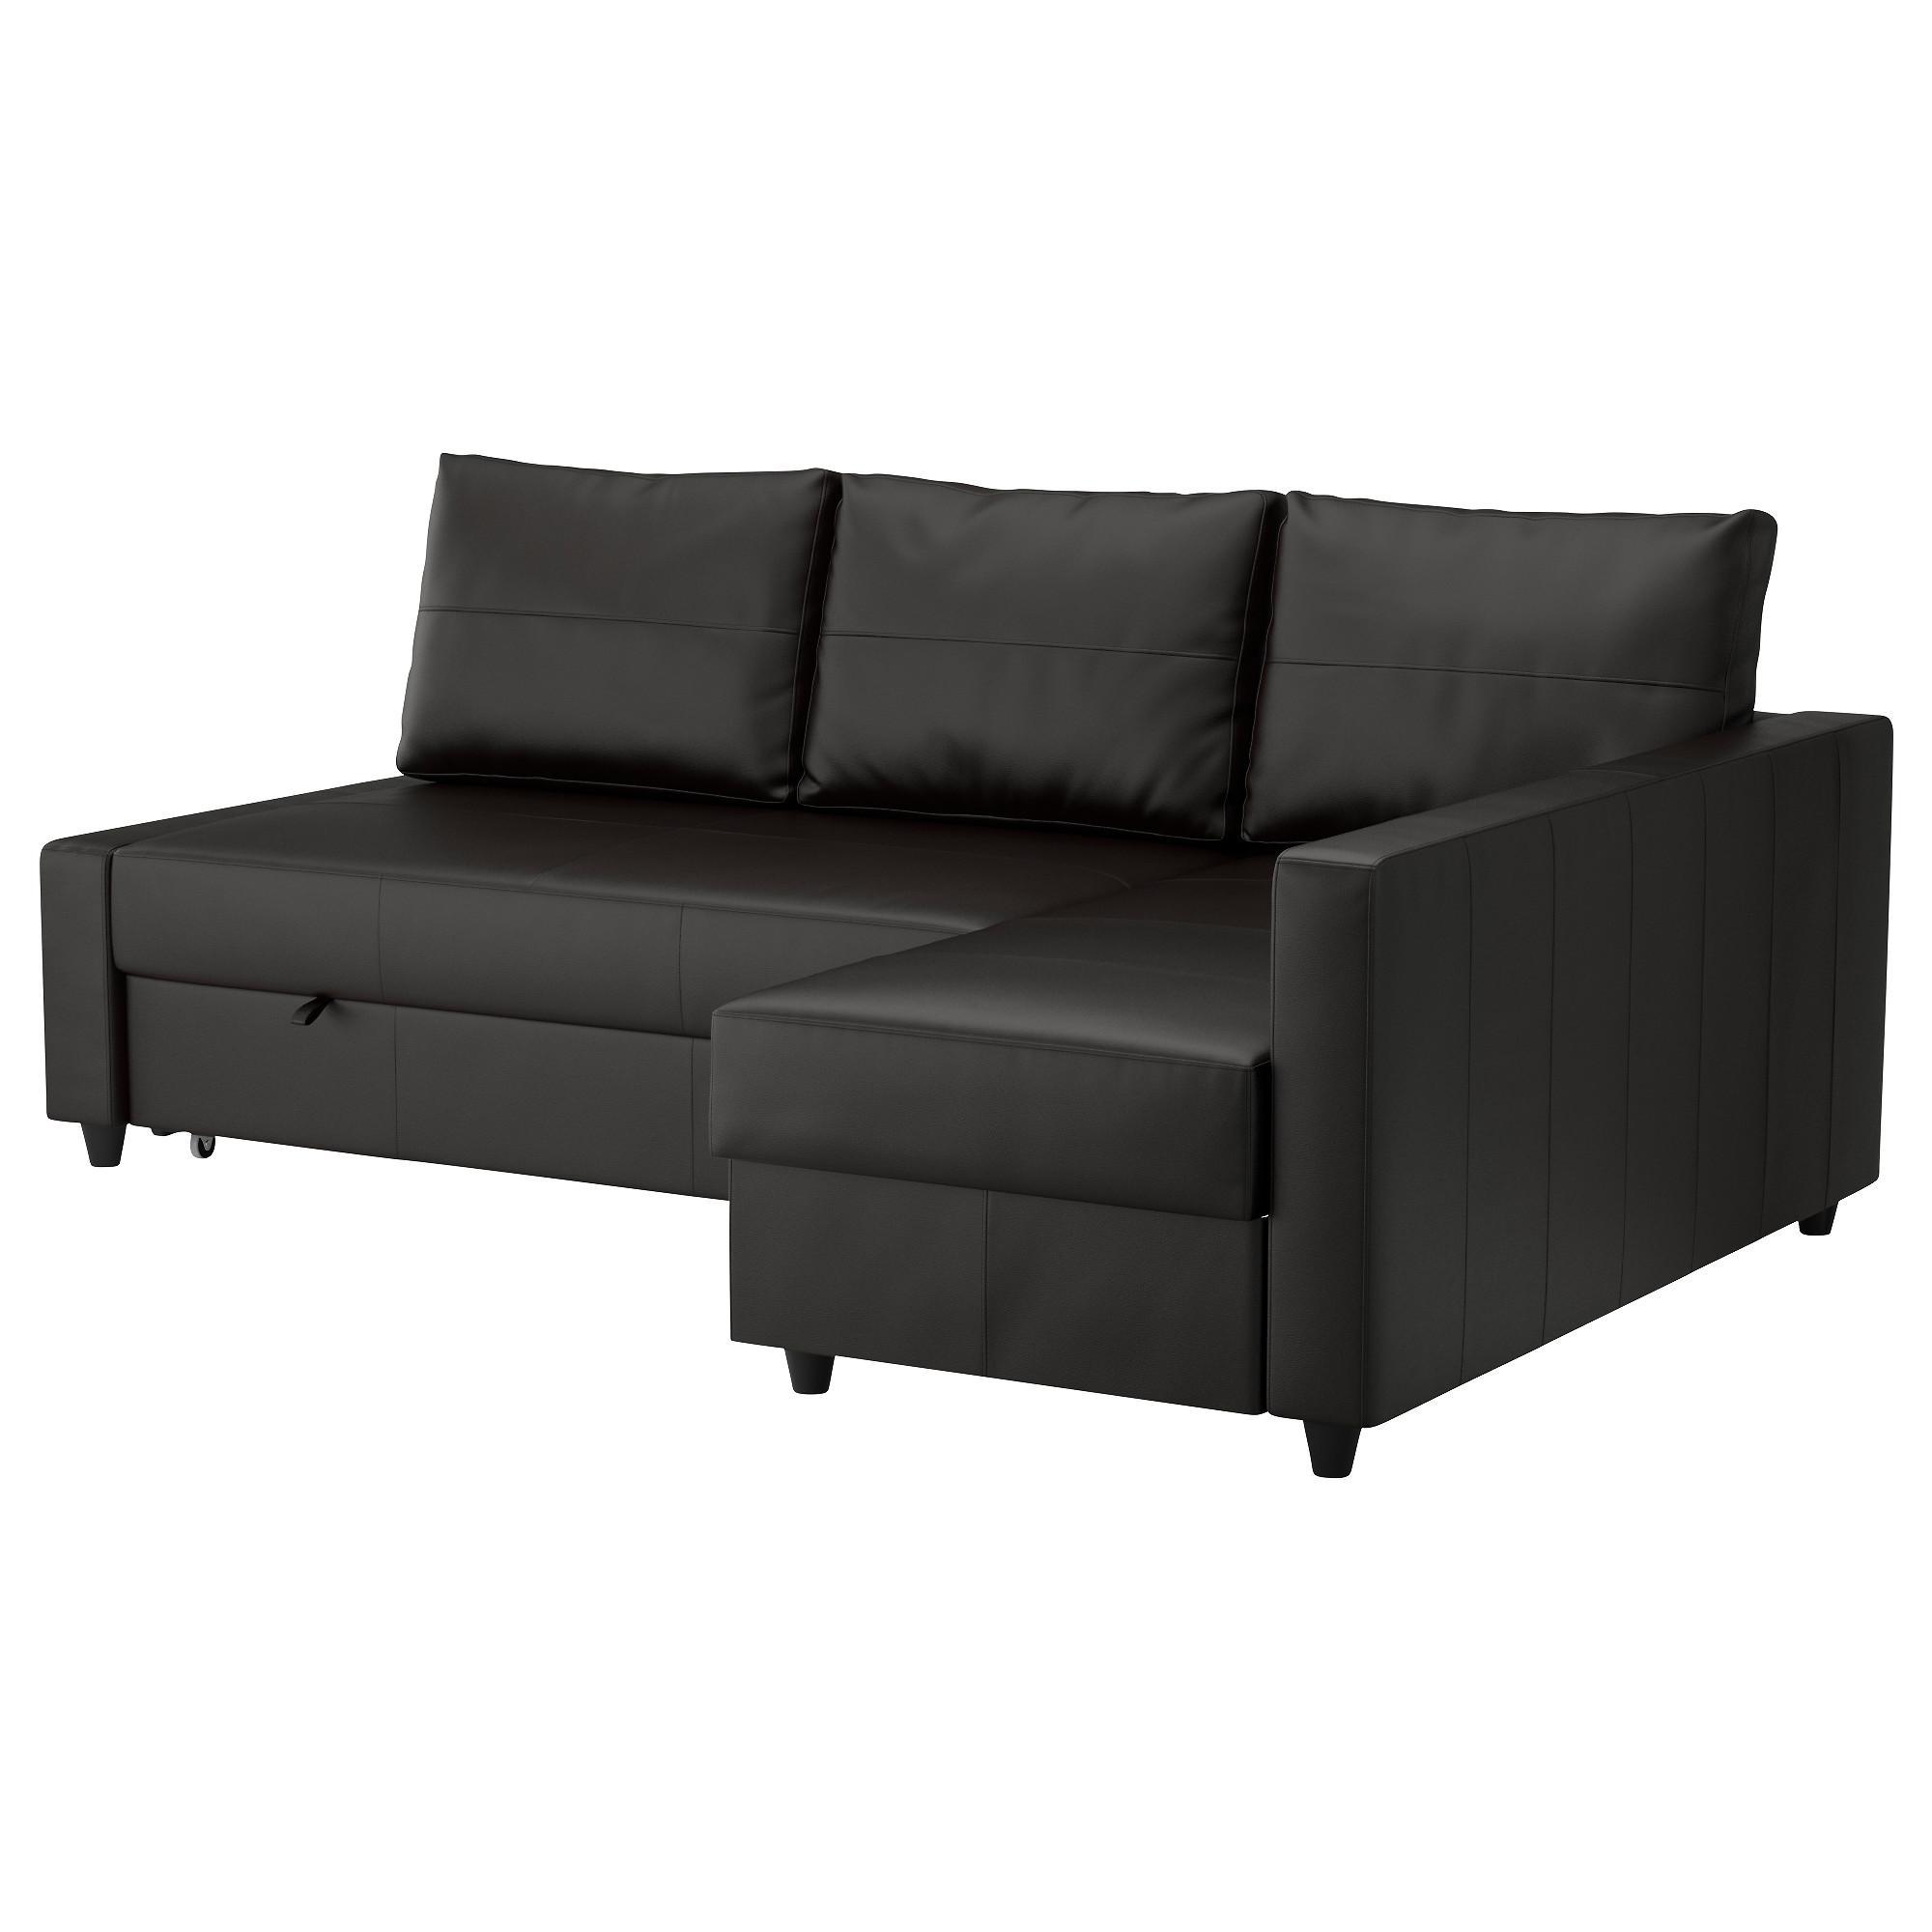 Friheten Corner Sofa Bed With Storage Bomstad Black – Ikea Within Corner Sofa Bed With Storage Ikea (View 5 of 20)